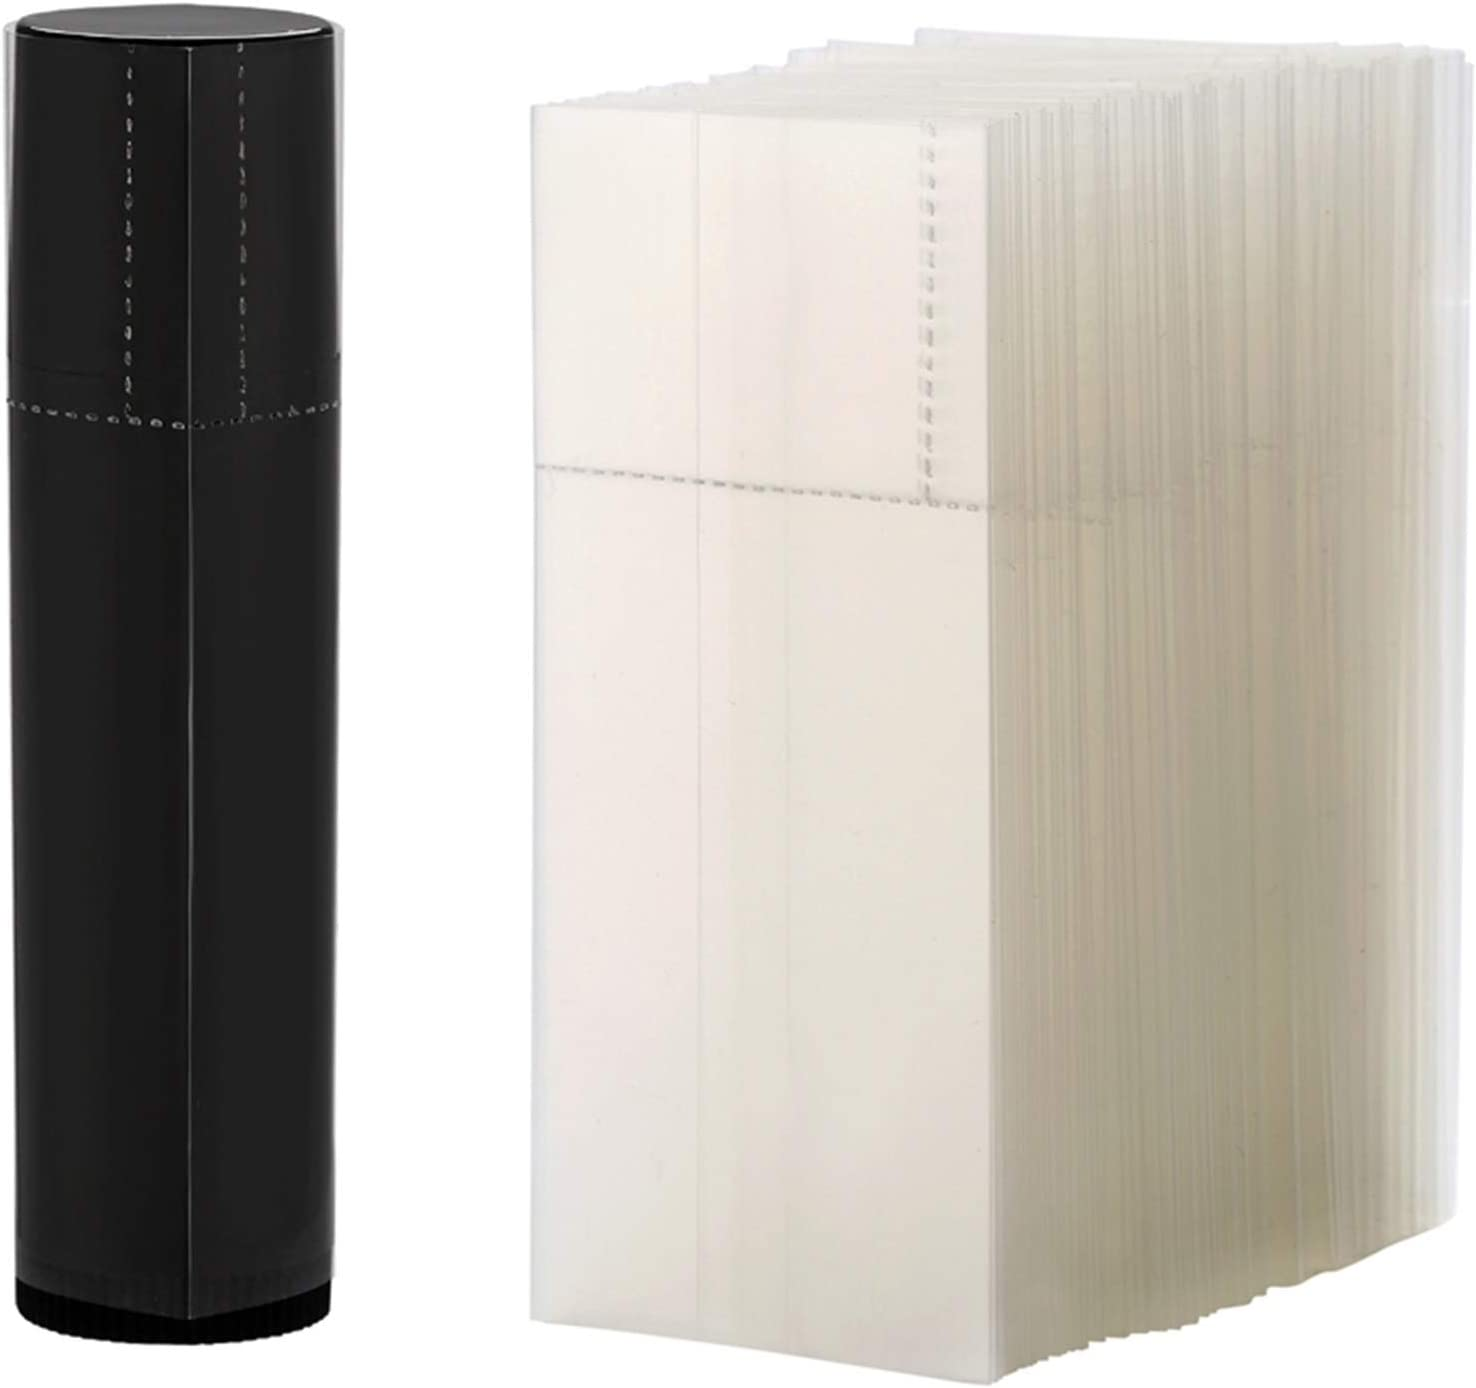 XMEIFEI depot Ranking TOP7 PARTS 500Pcs Shrink Wraps Lipsti Lip Balm Containers for